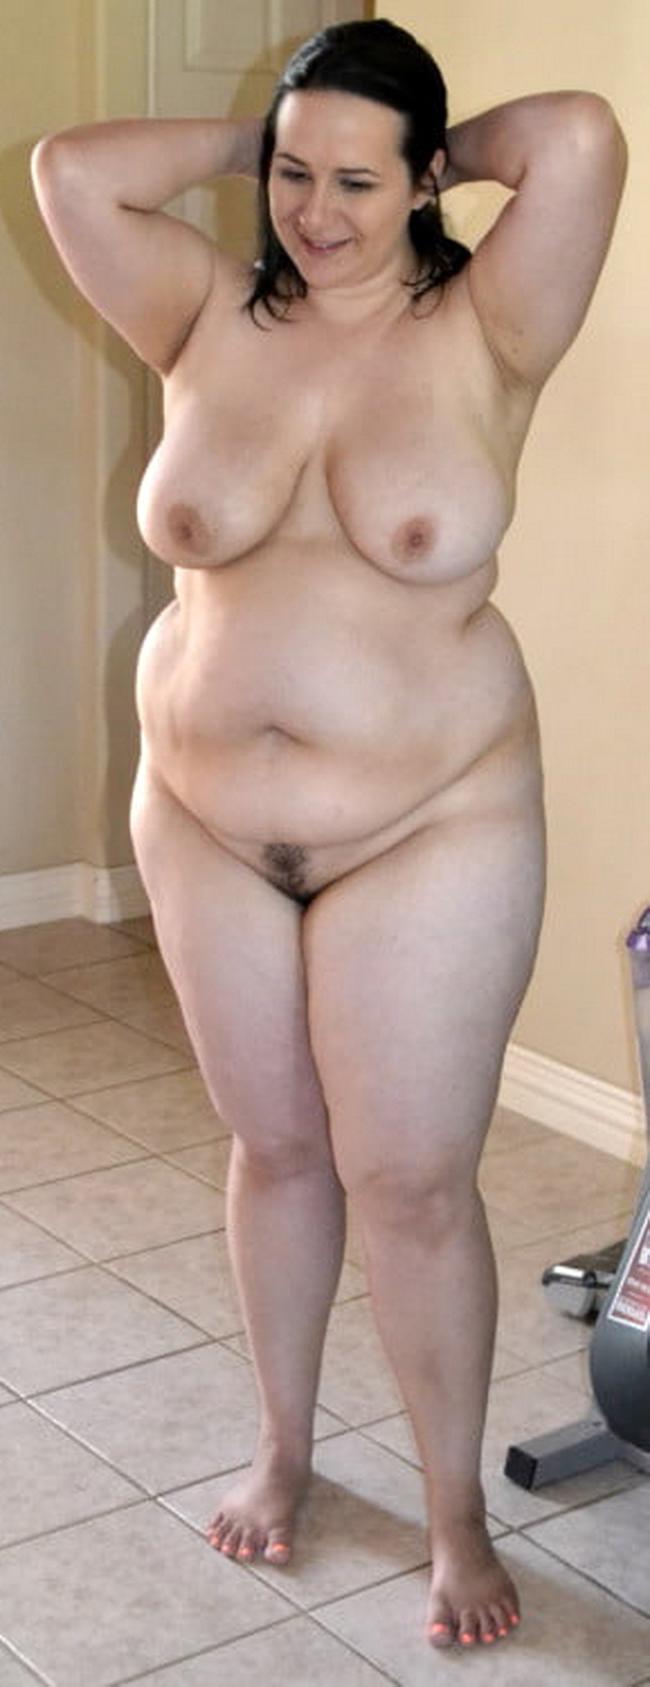 Pics nude chubby Ooh Fatties